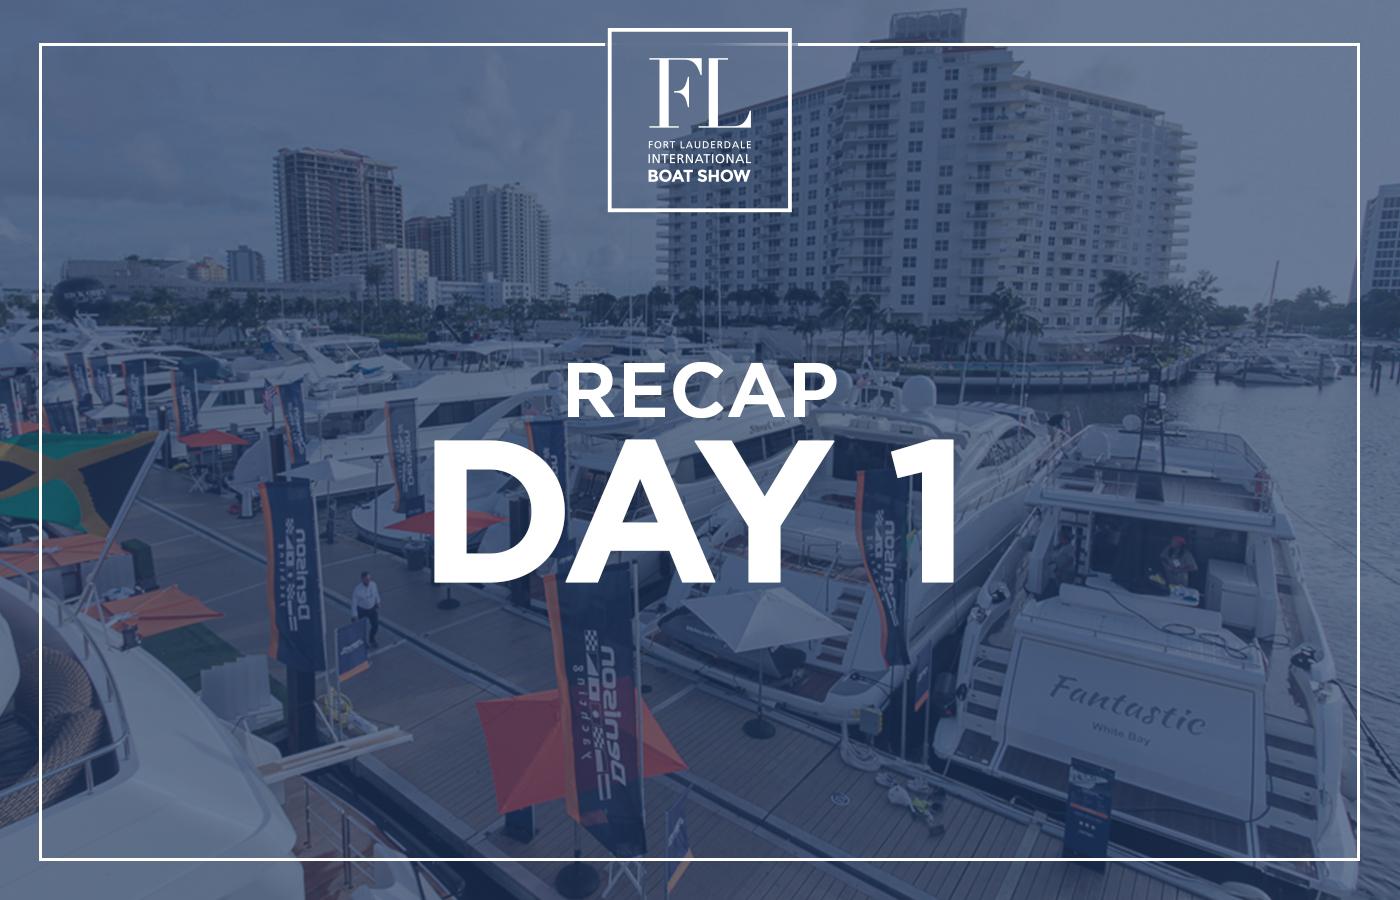 FLIBS 2020 Recap Day 1